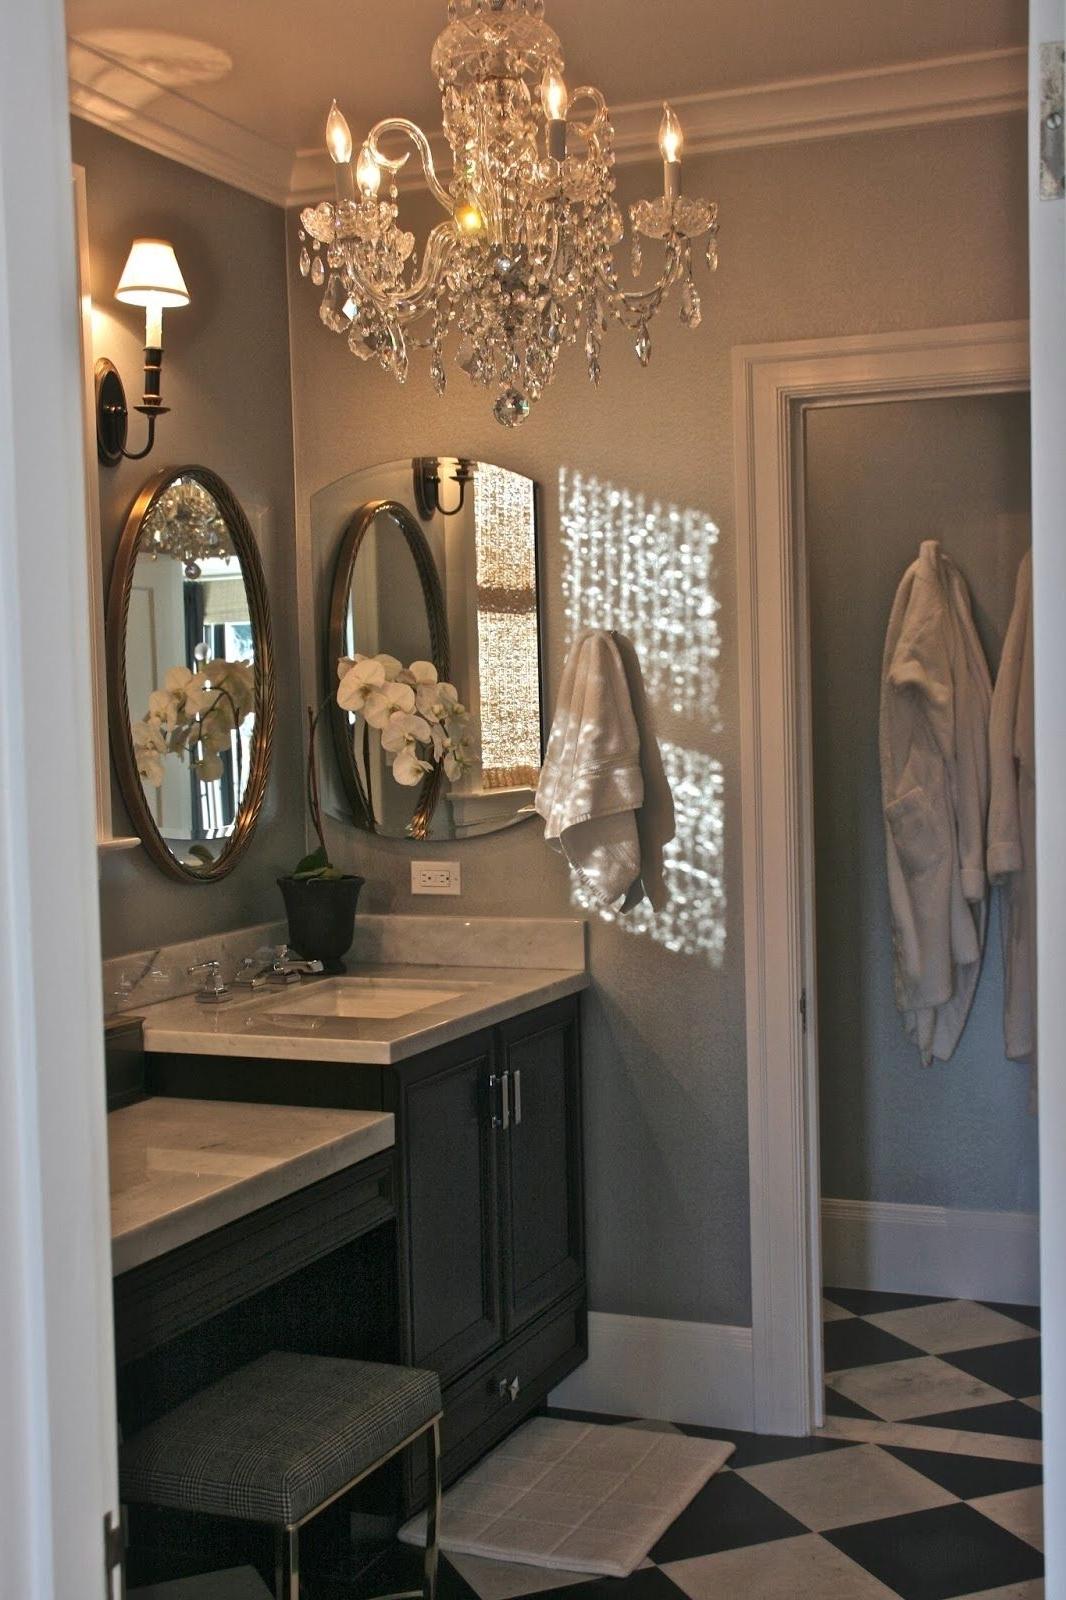 Recent Crystal Bathroom Chandelier For Elegant Retreat. .  (View 12 of 15)